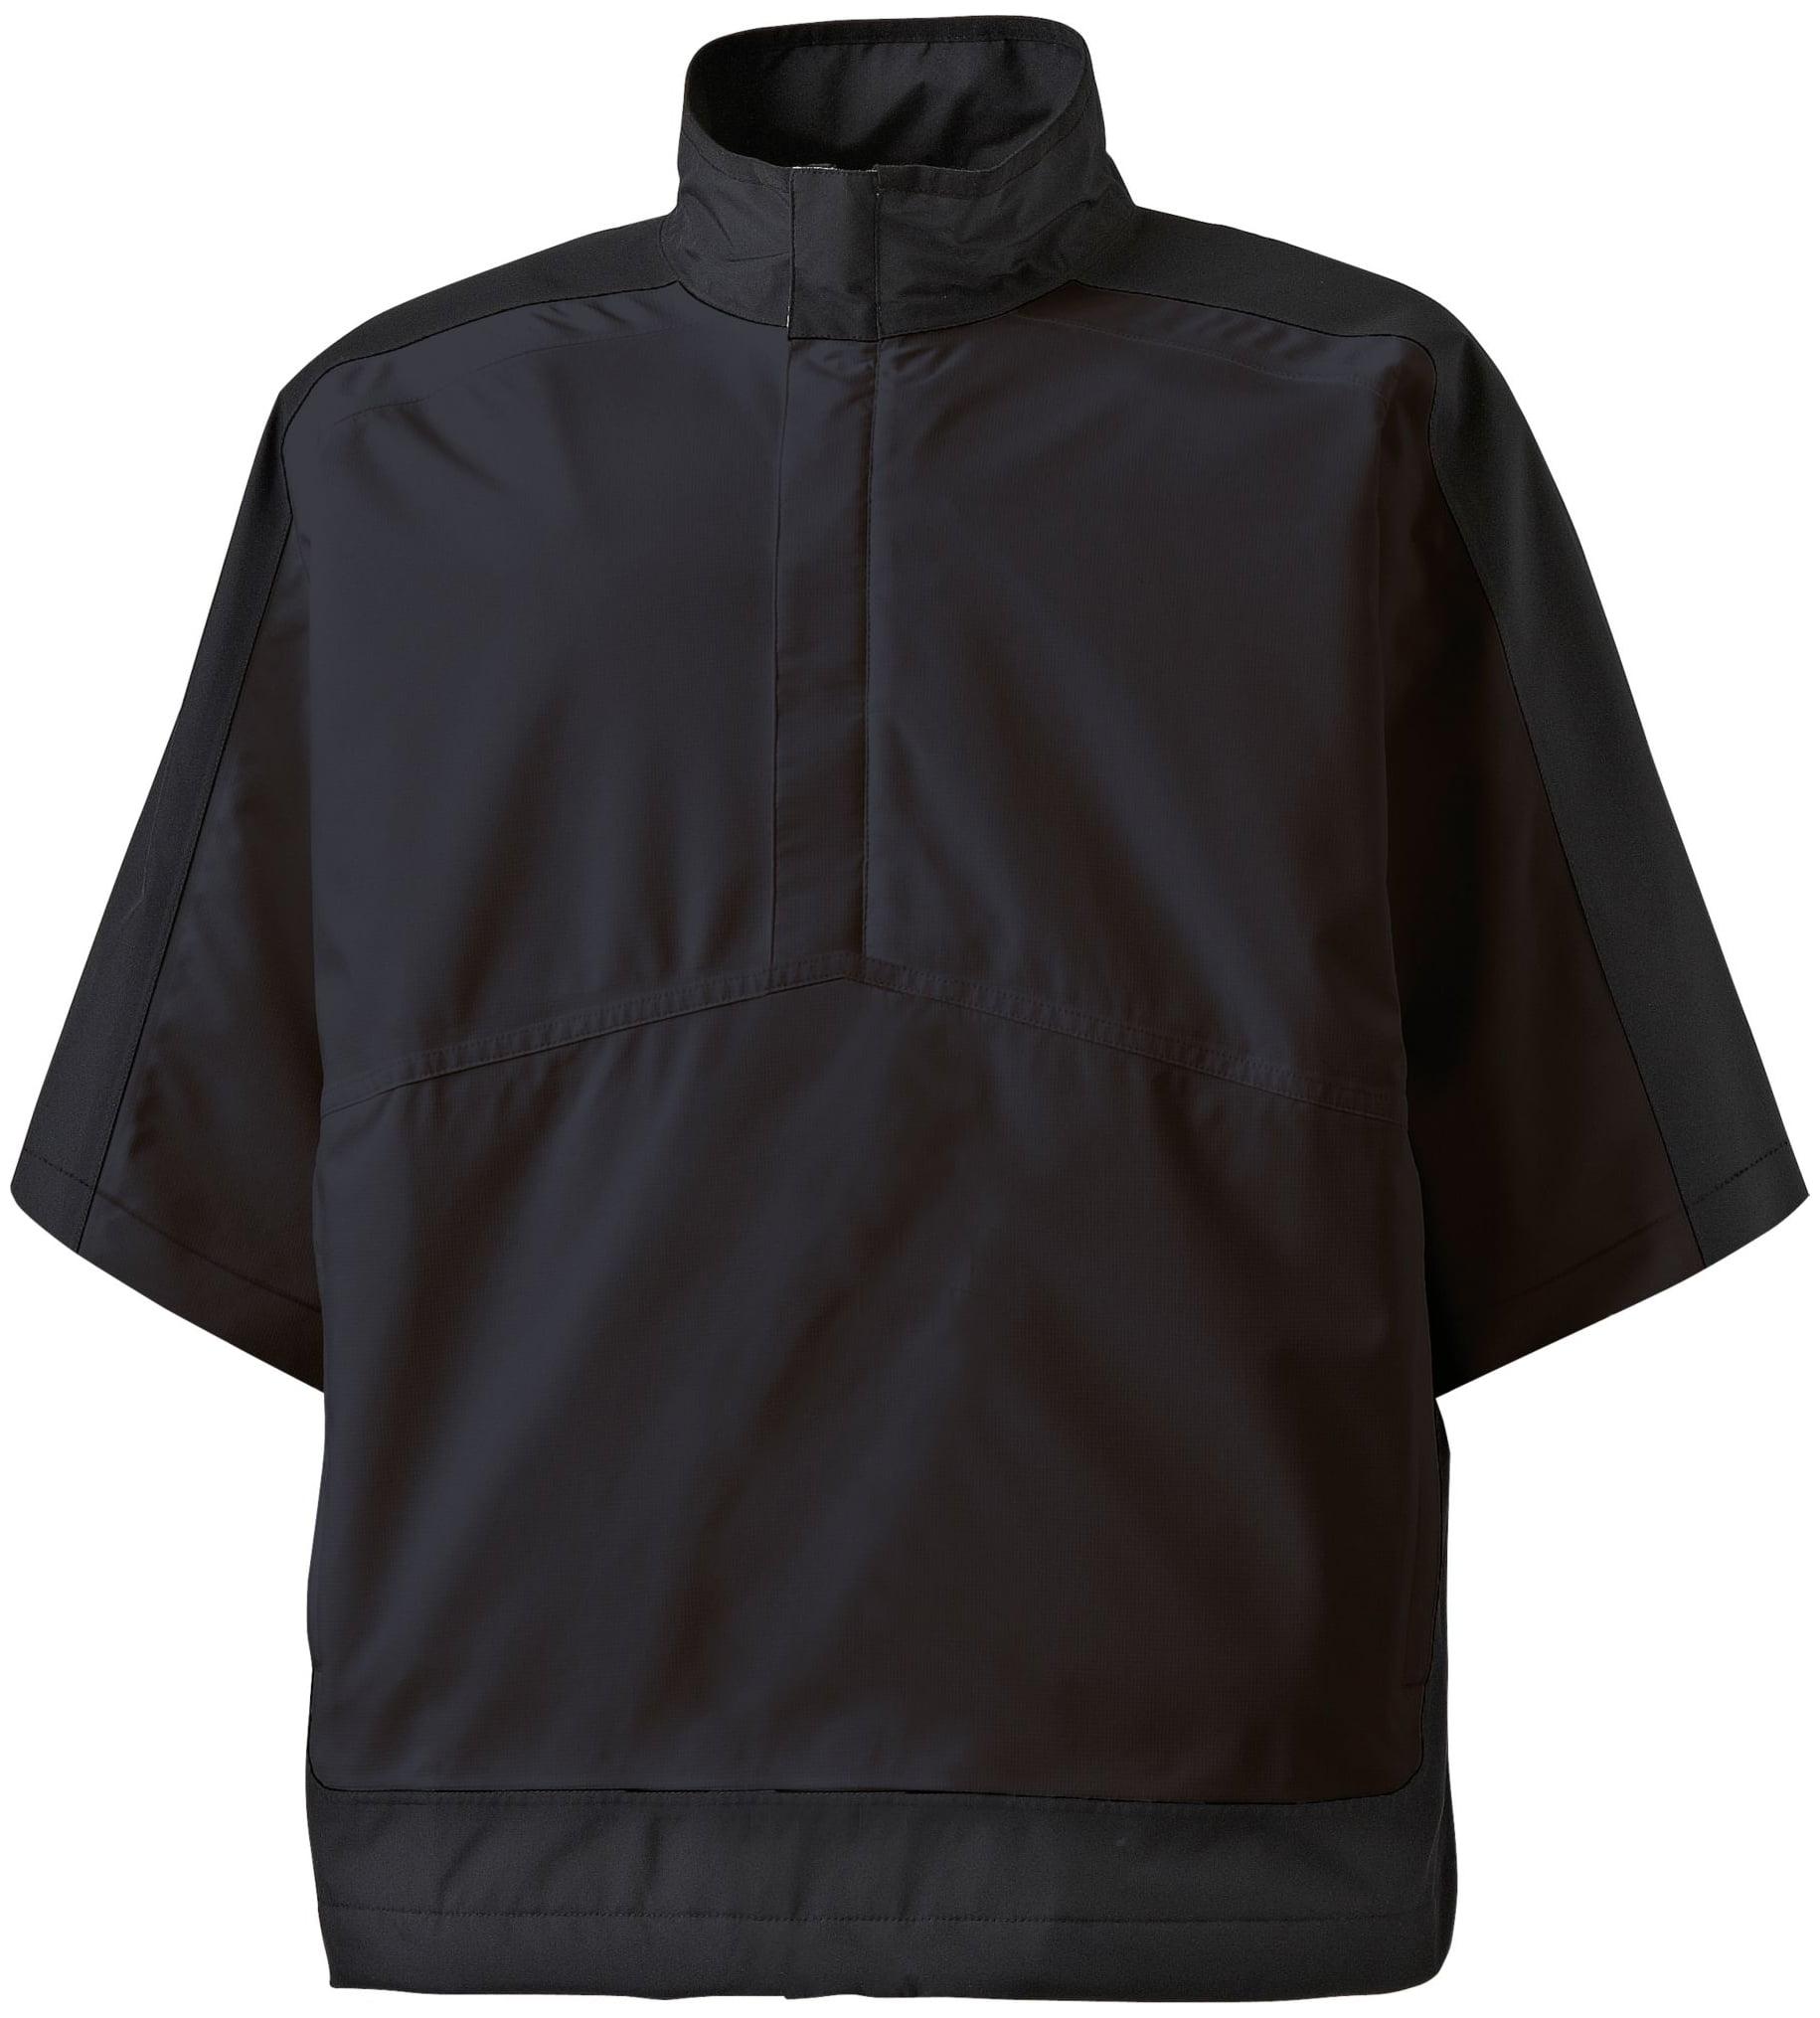 FootJoy Men's HydroLite Short Sleeve Golf Rain Shirt (Bla...